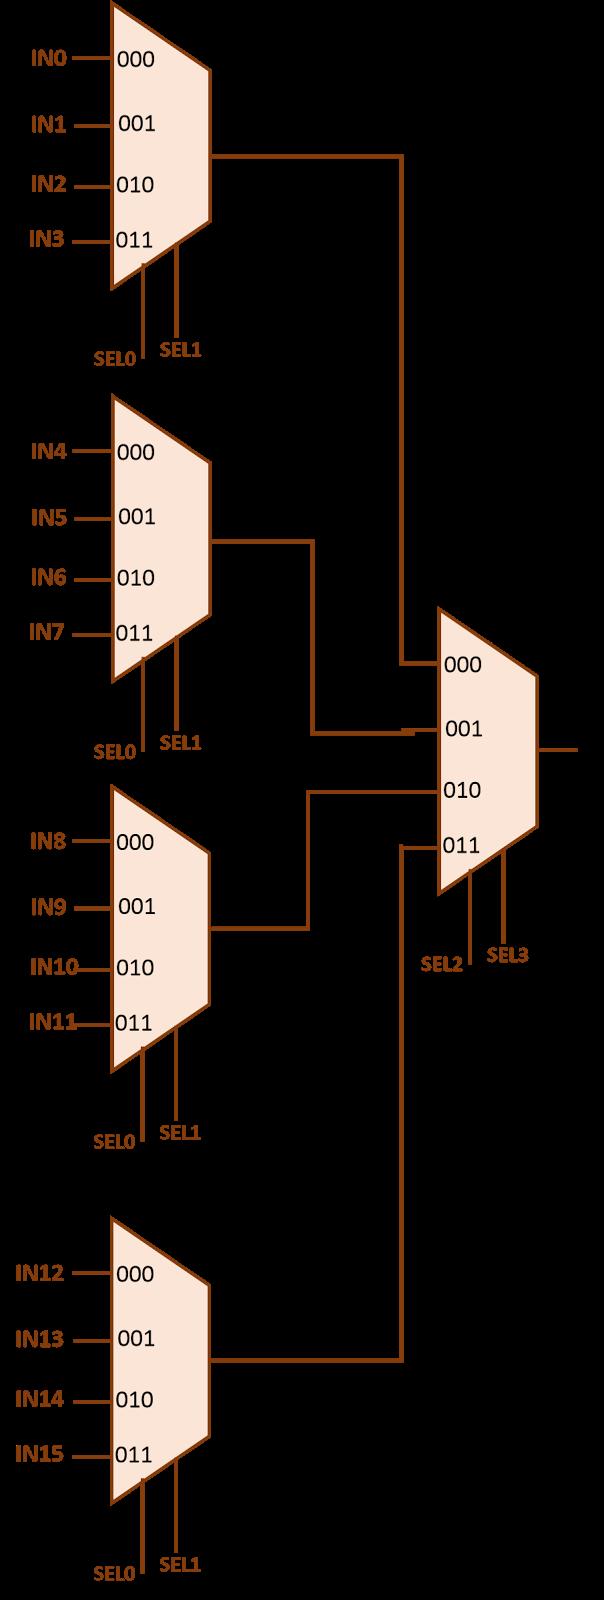 logic diagram of 8 to 1 multiplexer [ 604 x 1600 Pixel ]